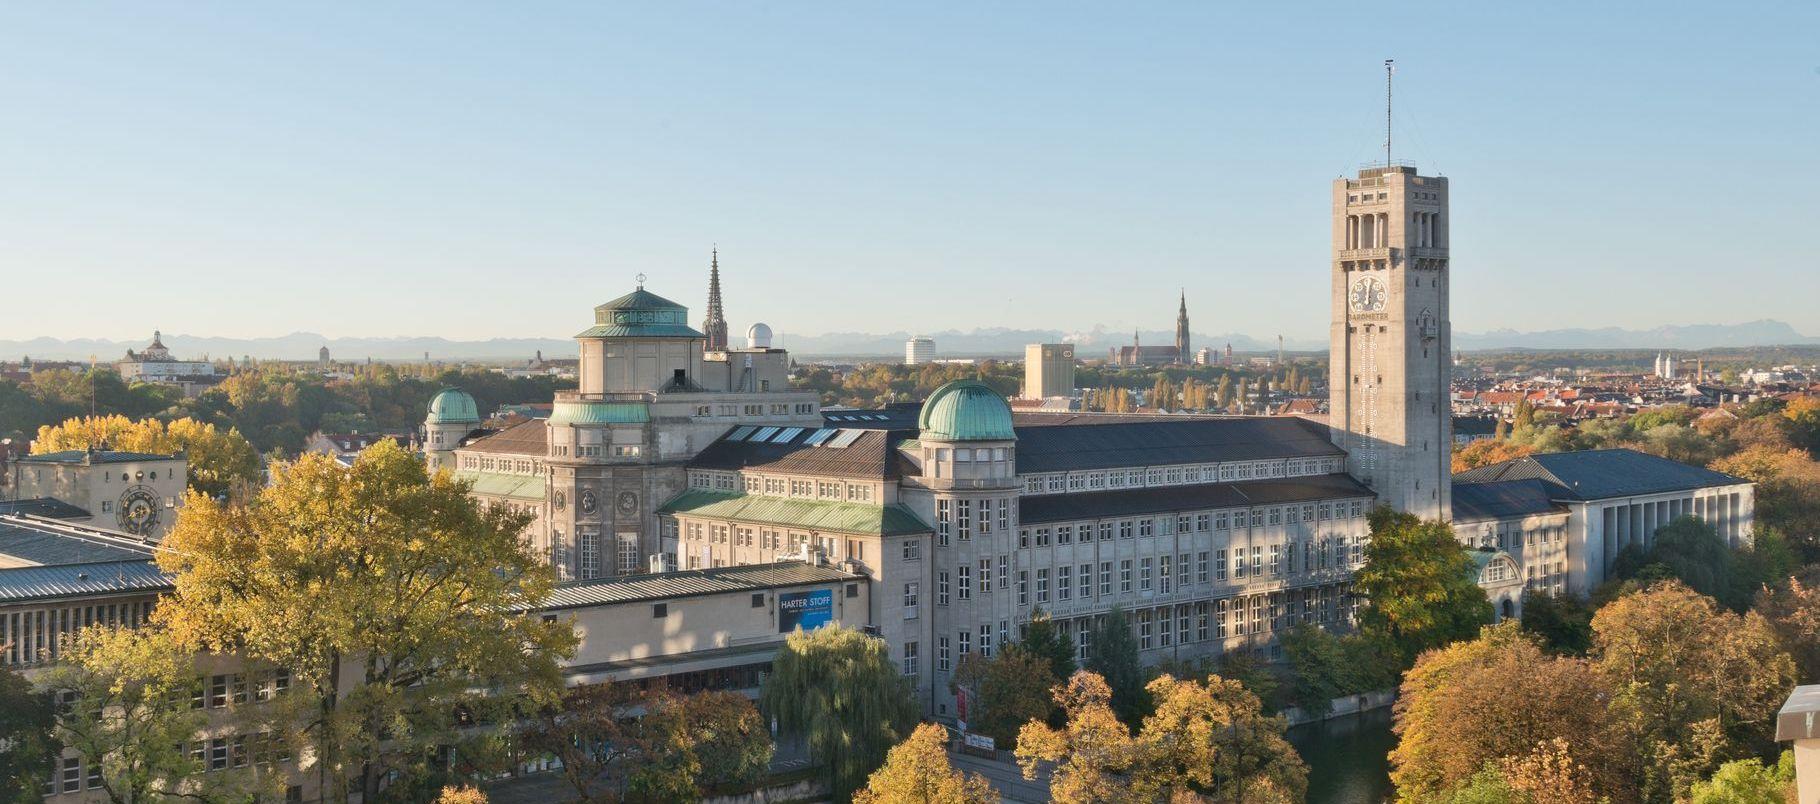 Kunst und Kultur: Virtuelle Museumstour in München